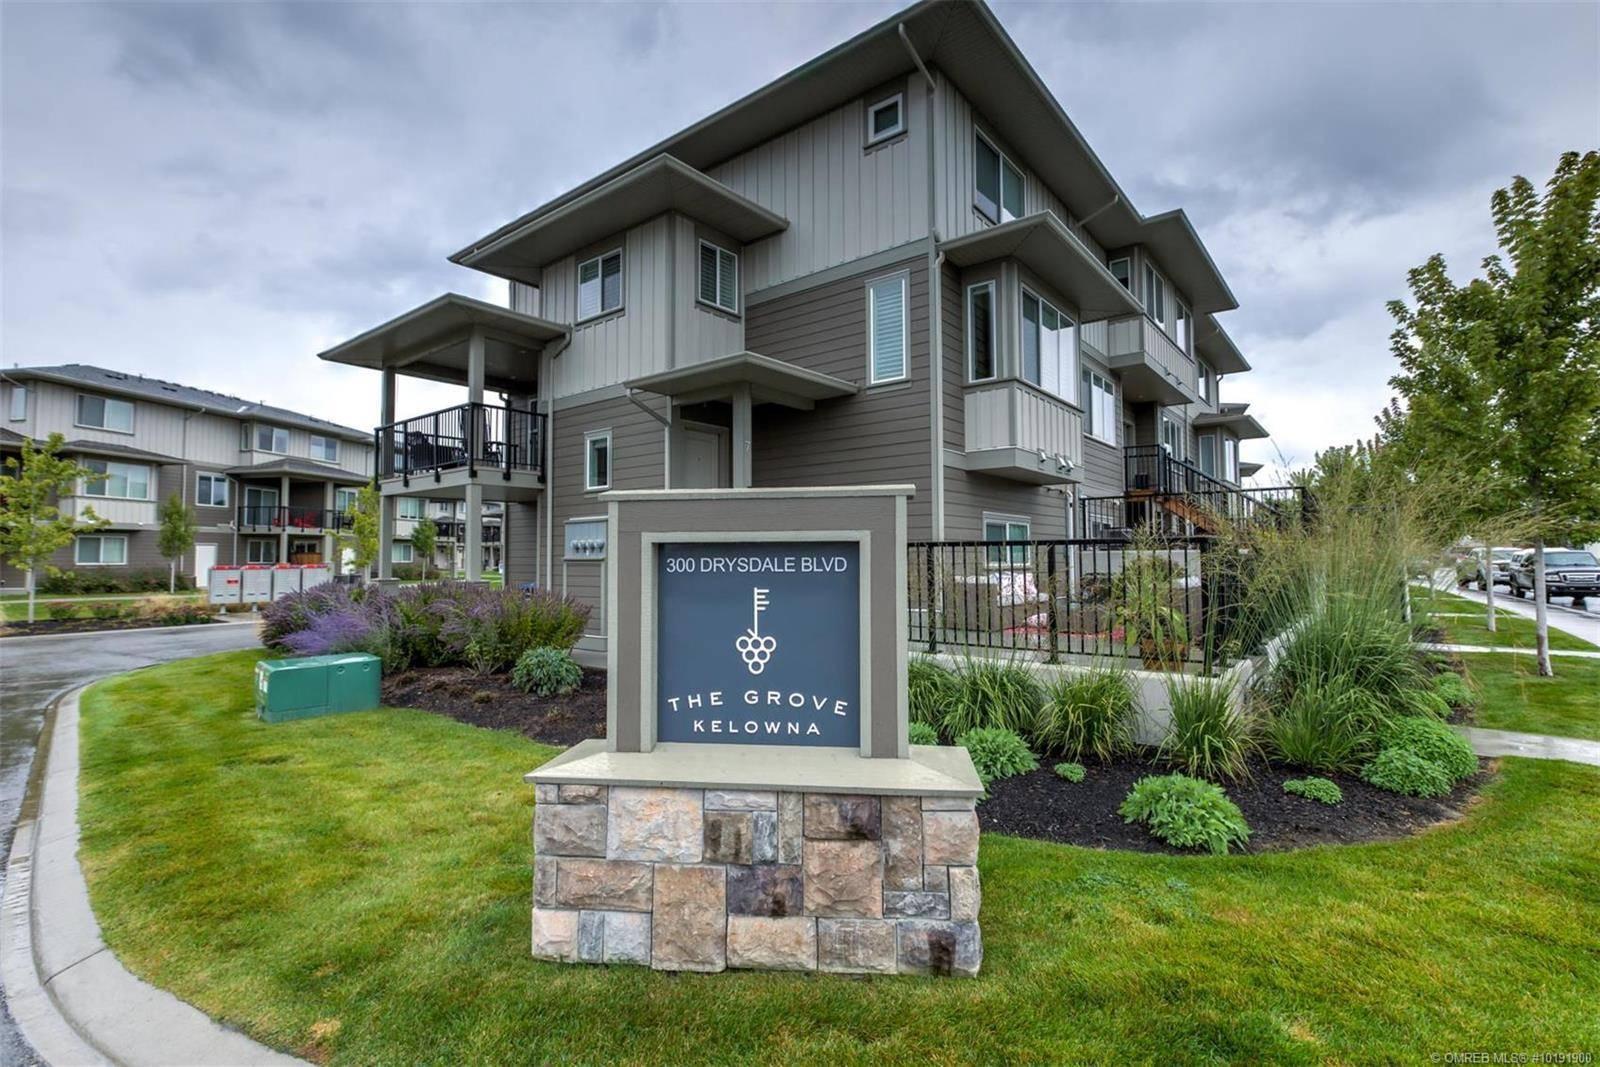 Townhouse for sale at 300 Drysdale Blvd Unit 6 Kelowna British Columbia - MLS: 10191900